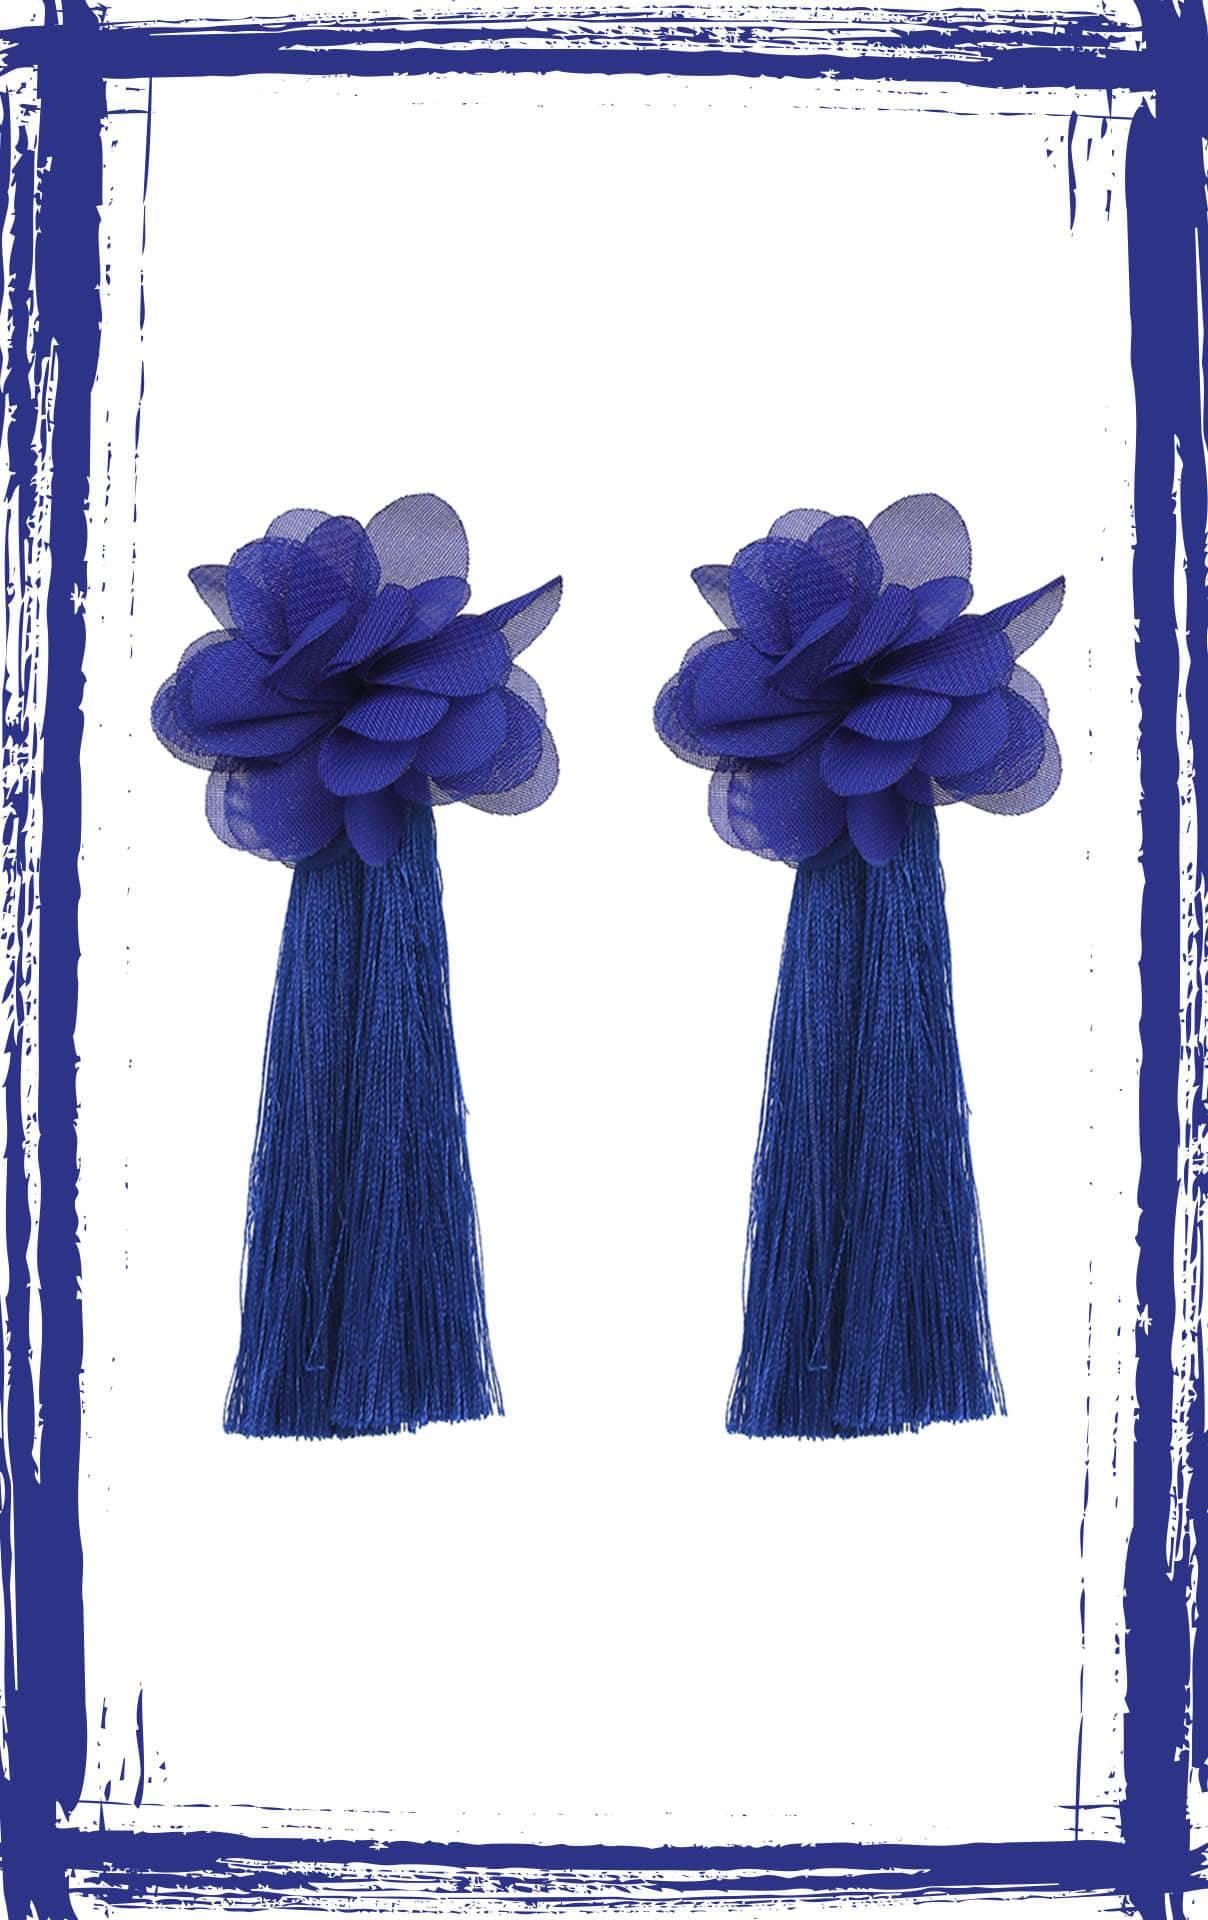 Aretes de borlas con flor de gaza. Alto: 11.5 cm, ancho: 5.5 cm, peso: 10 gr.